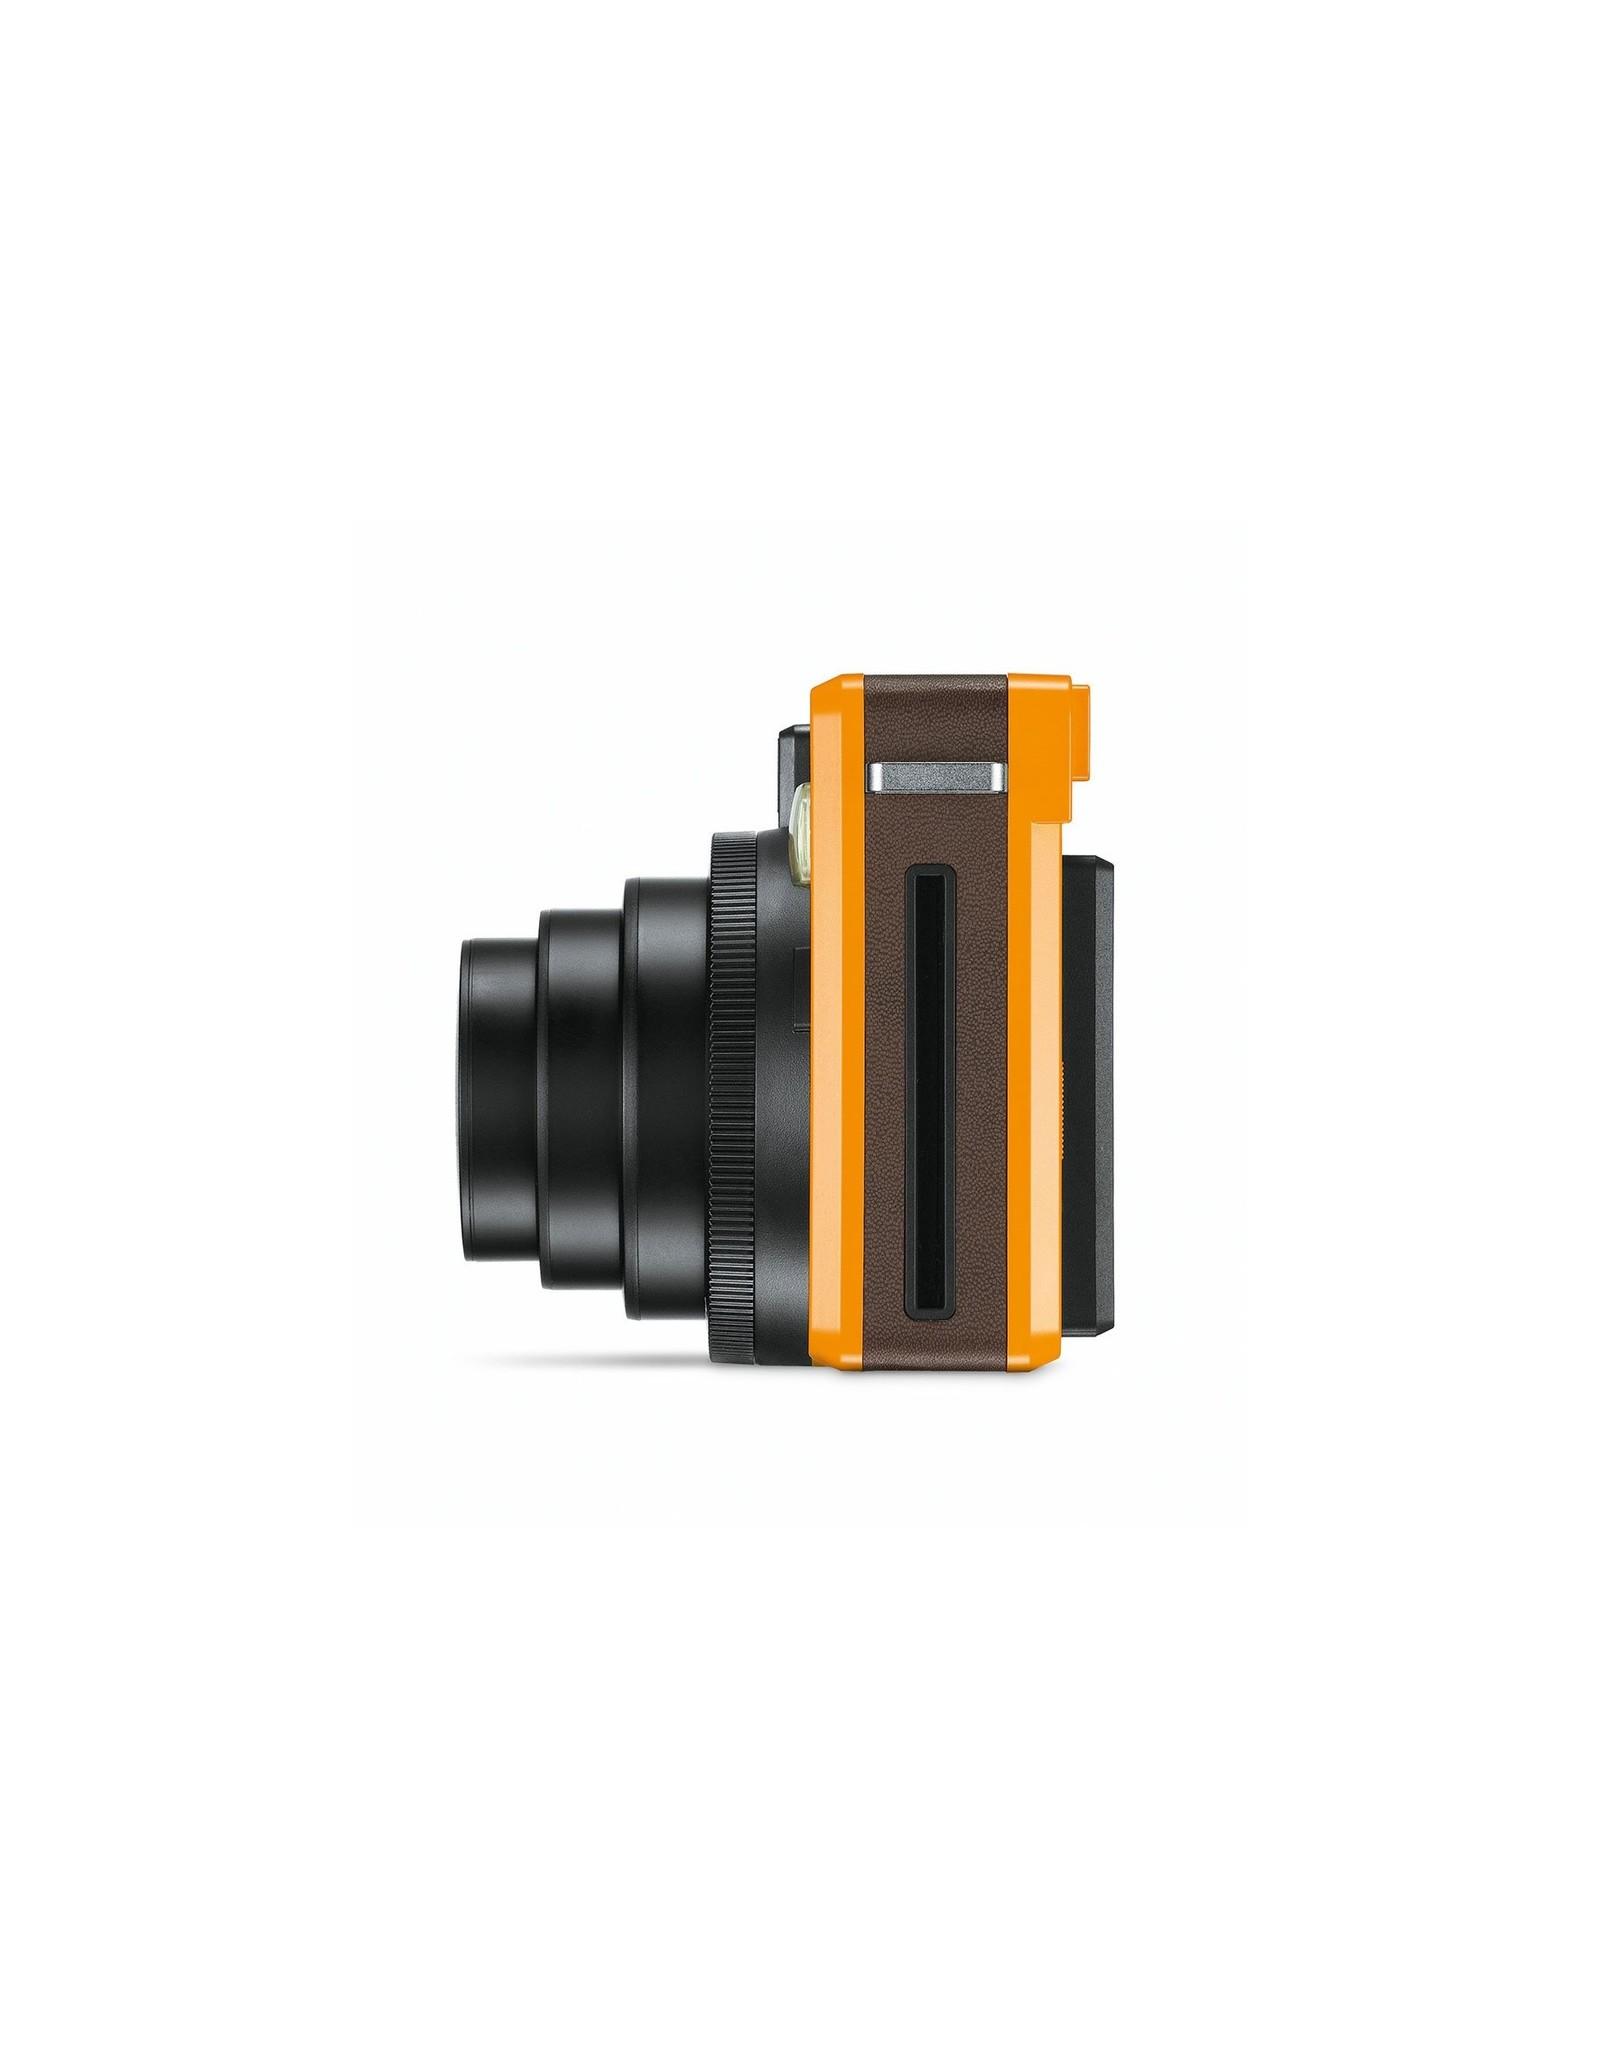 Leica Leica SOFORT Camera Orange   191-02